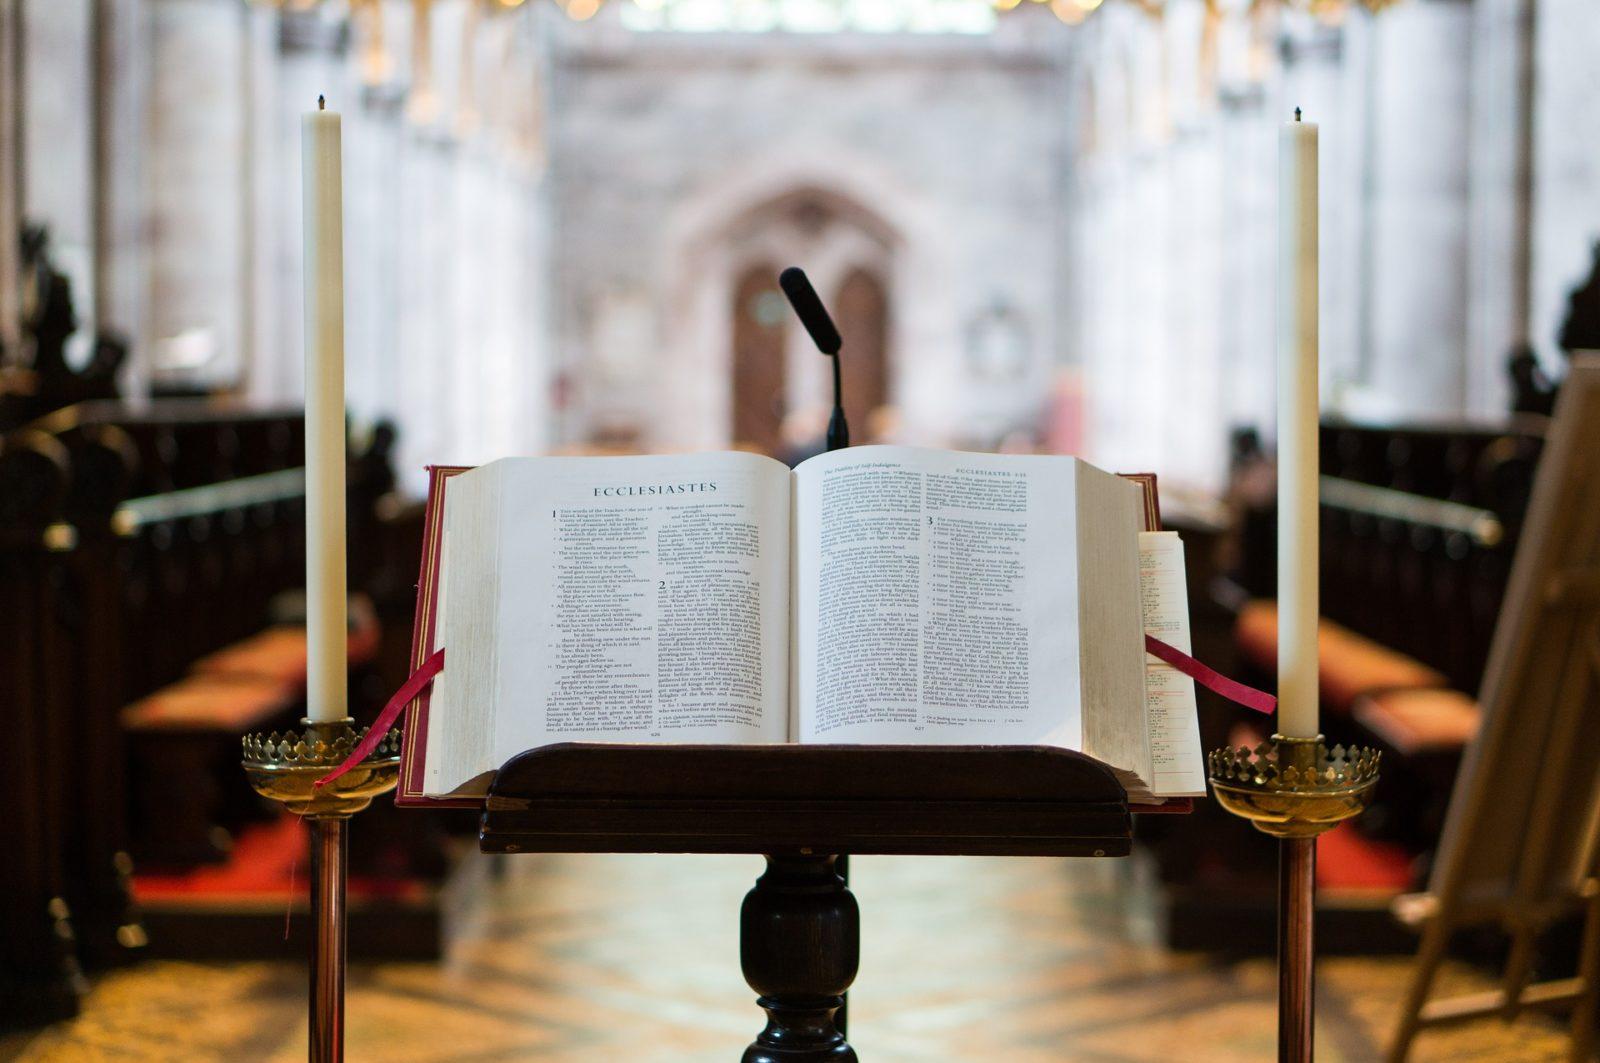 bible-1850905_1920